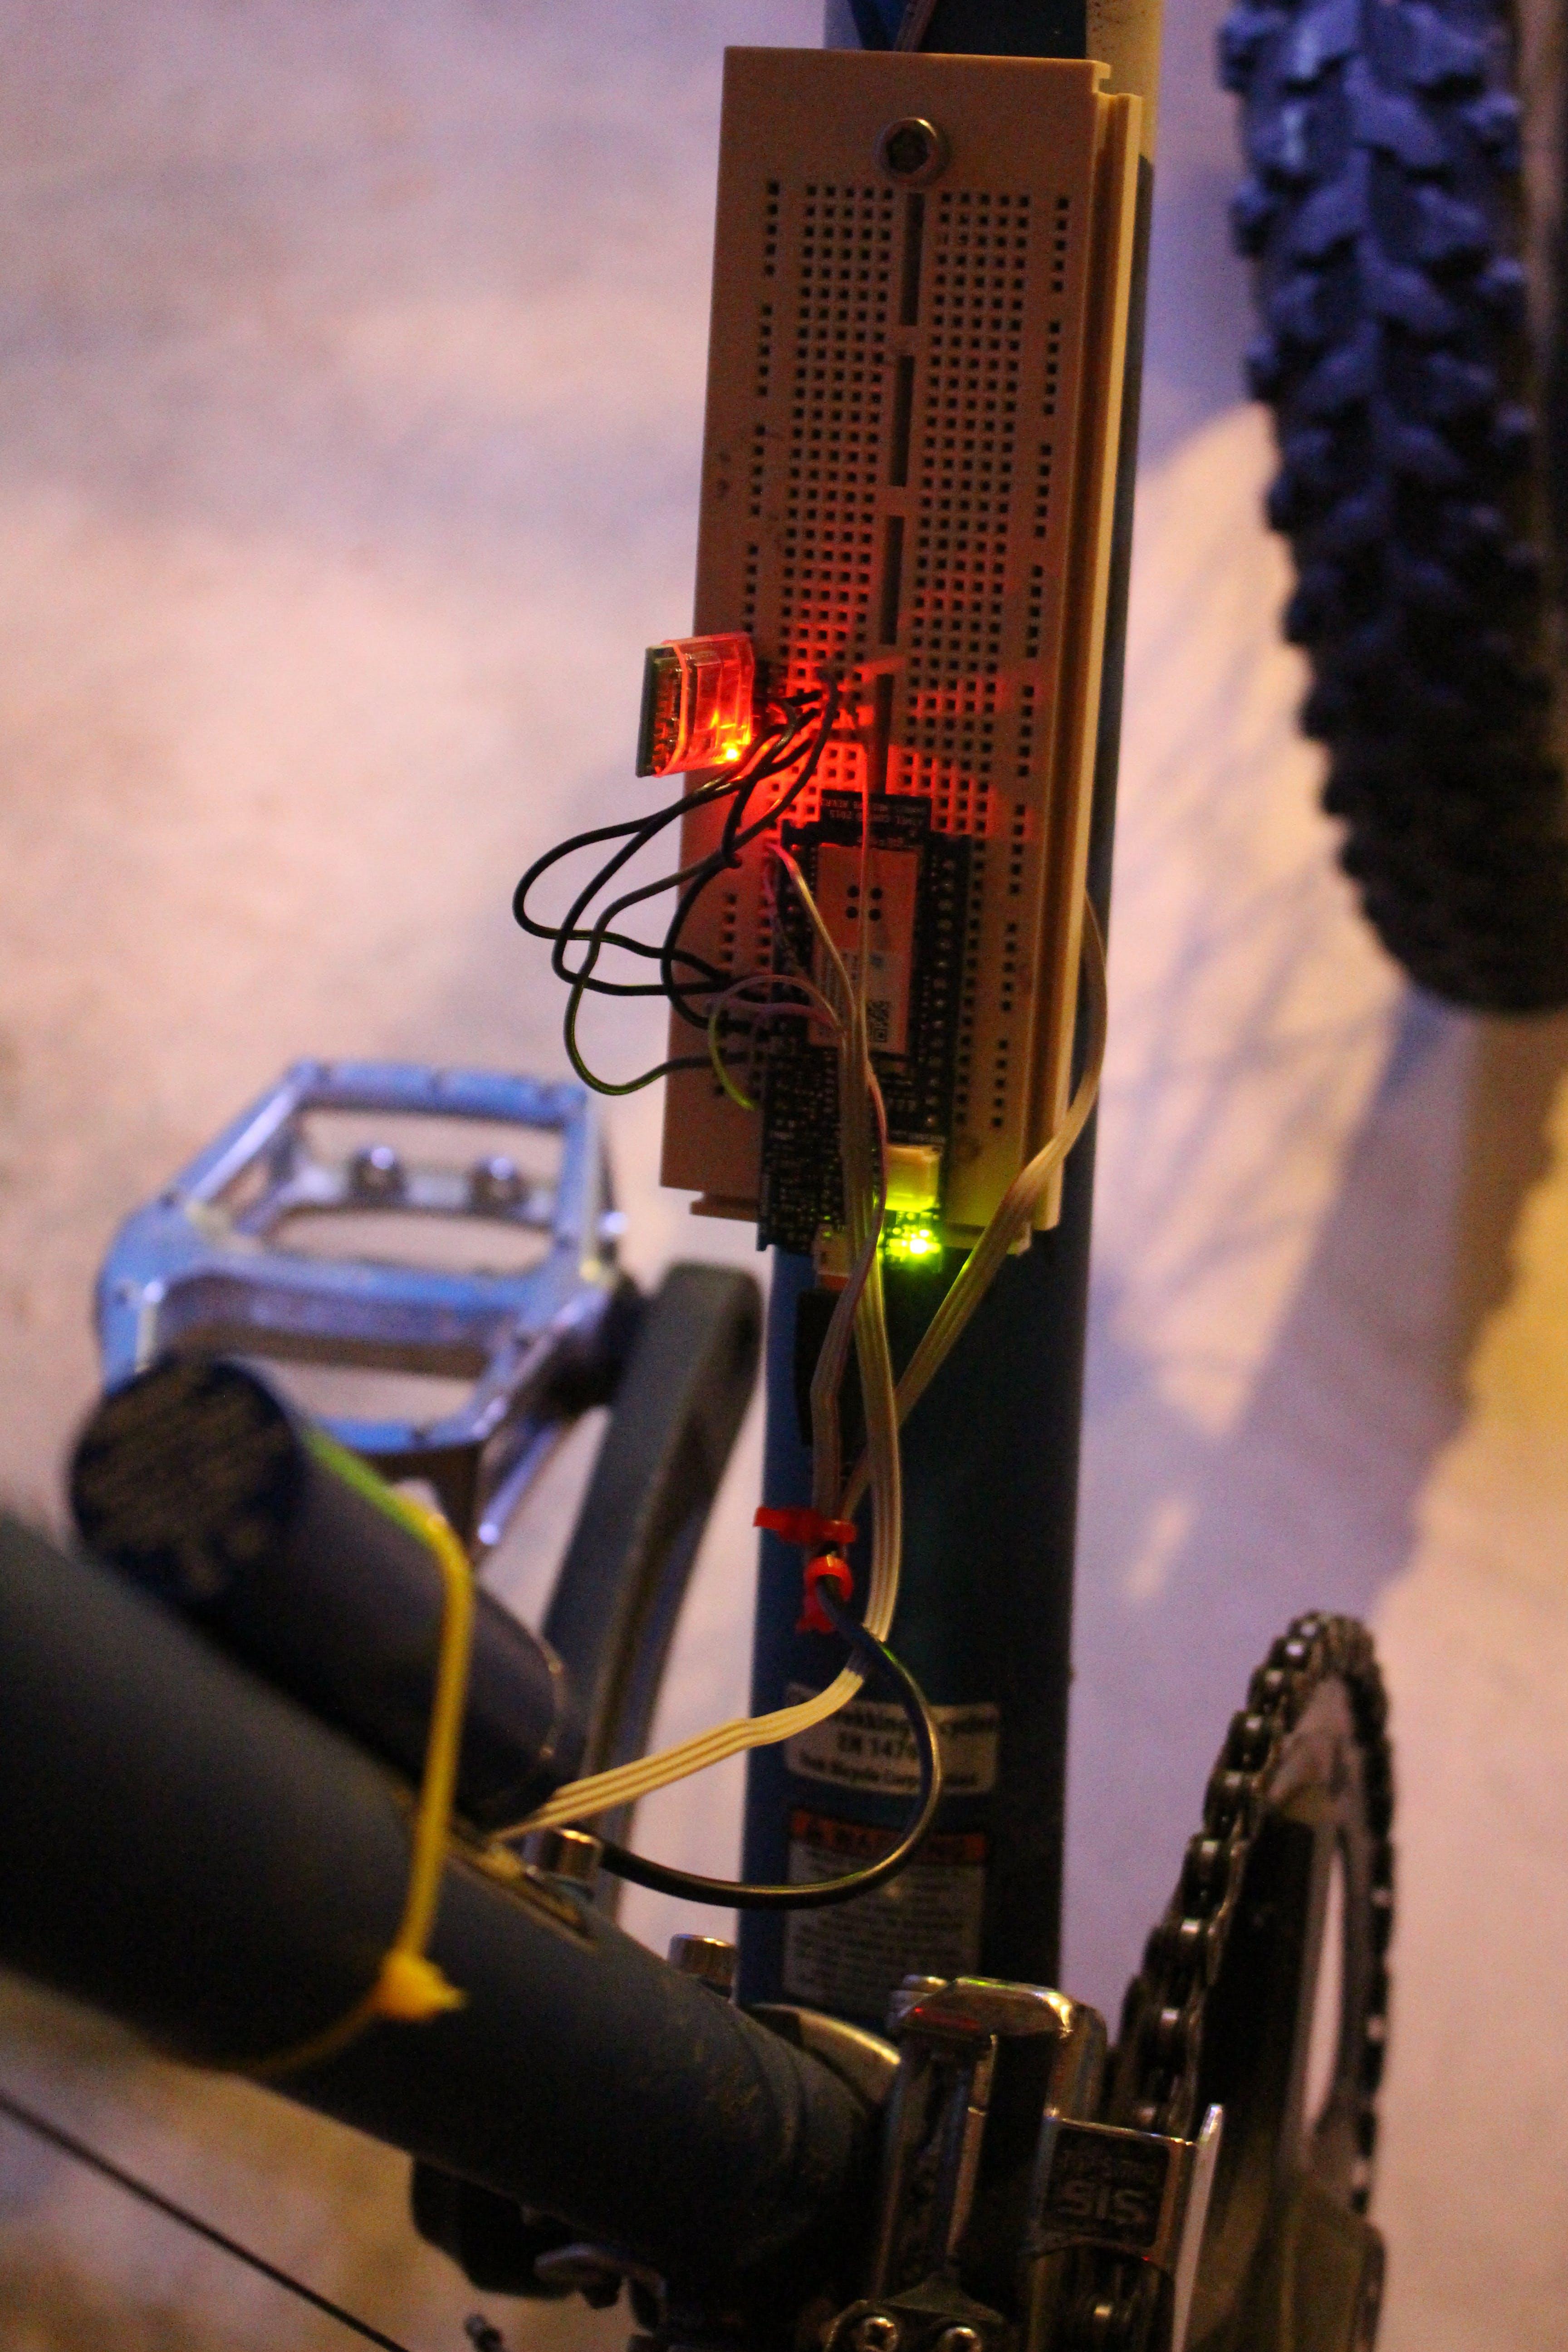 Arduino MKR1000 and a Bluetooth serial transceiver